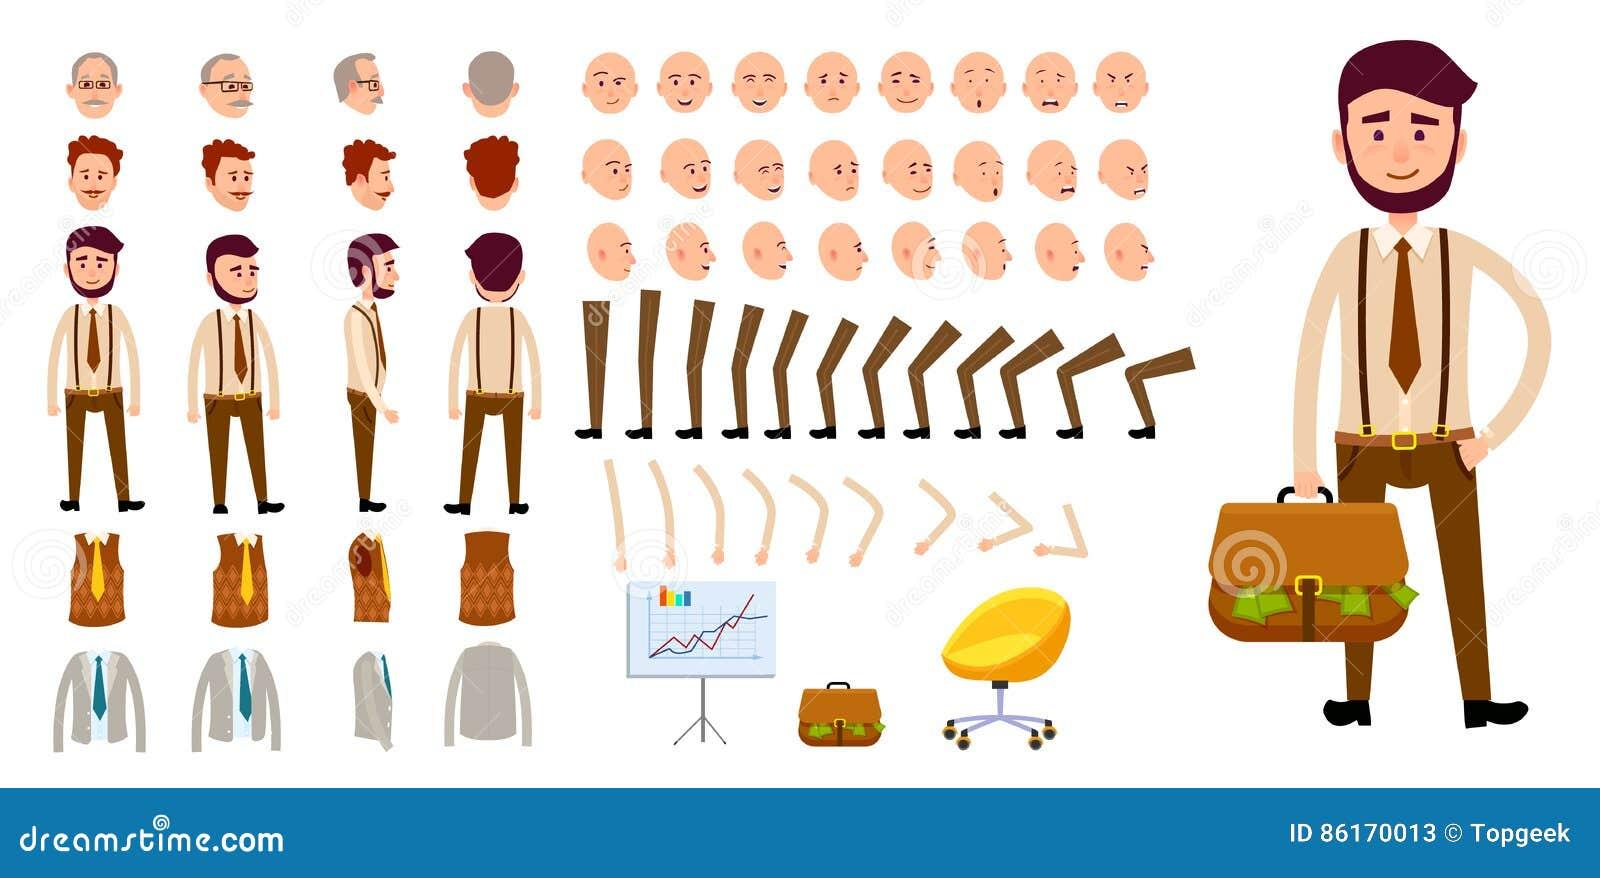 Stocks Download Shivam Creation: Businessman Character Creation Set. Cartoon Design Stock